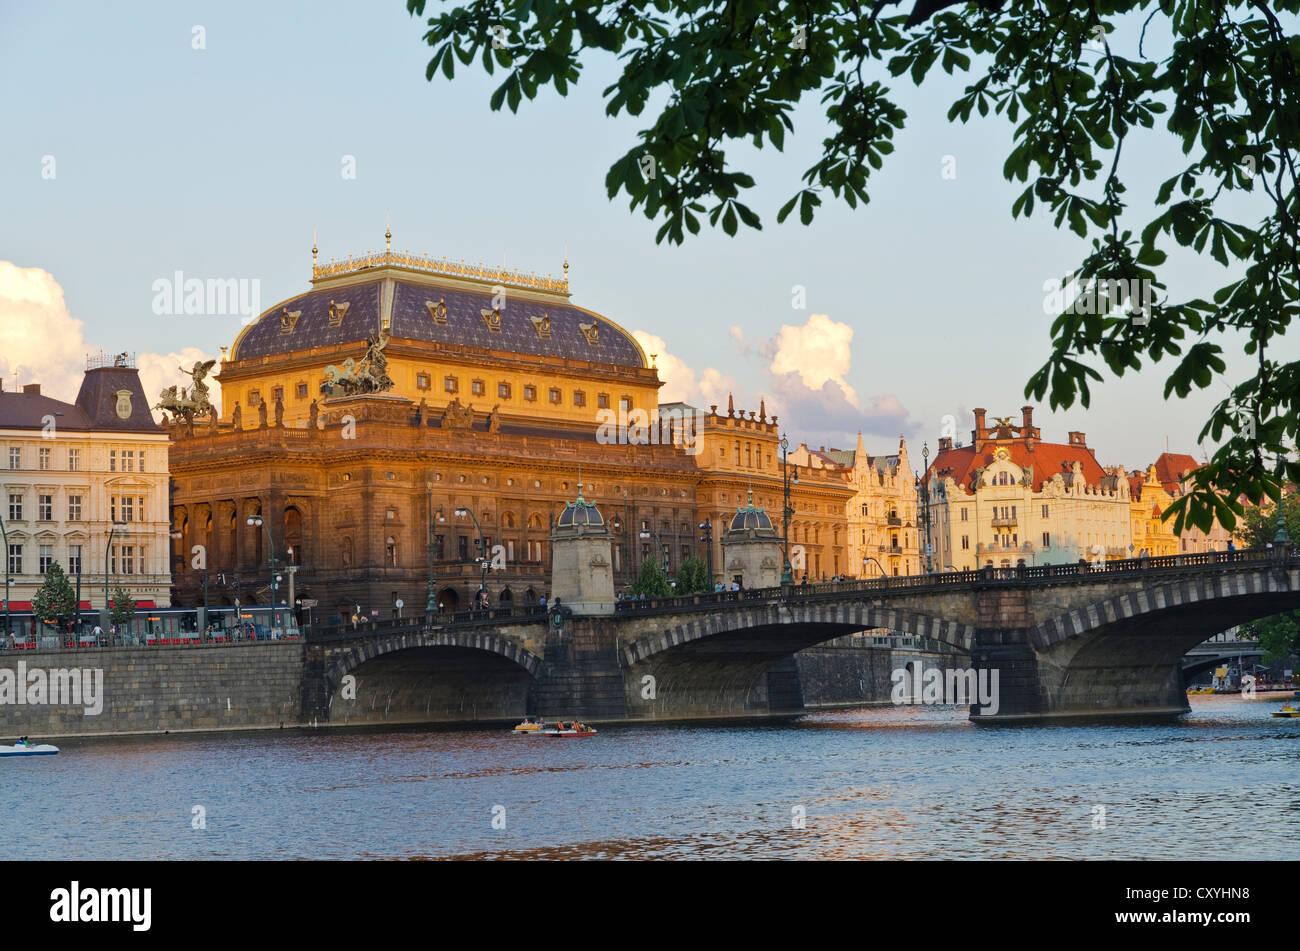 Národní divadlo, National Theatre, seen across river Vltava, Prague, Czech Republic, Europe - Stock Image